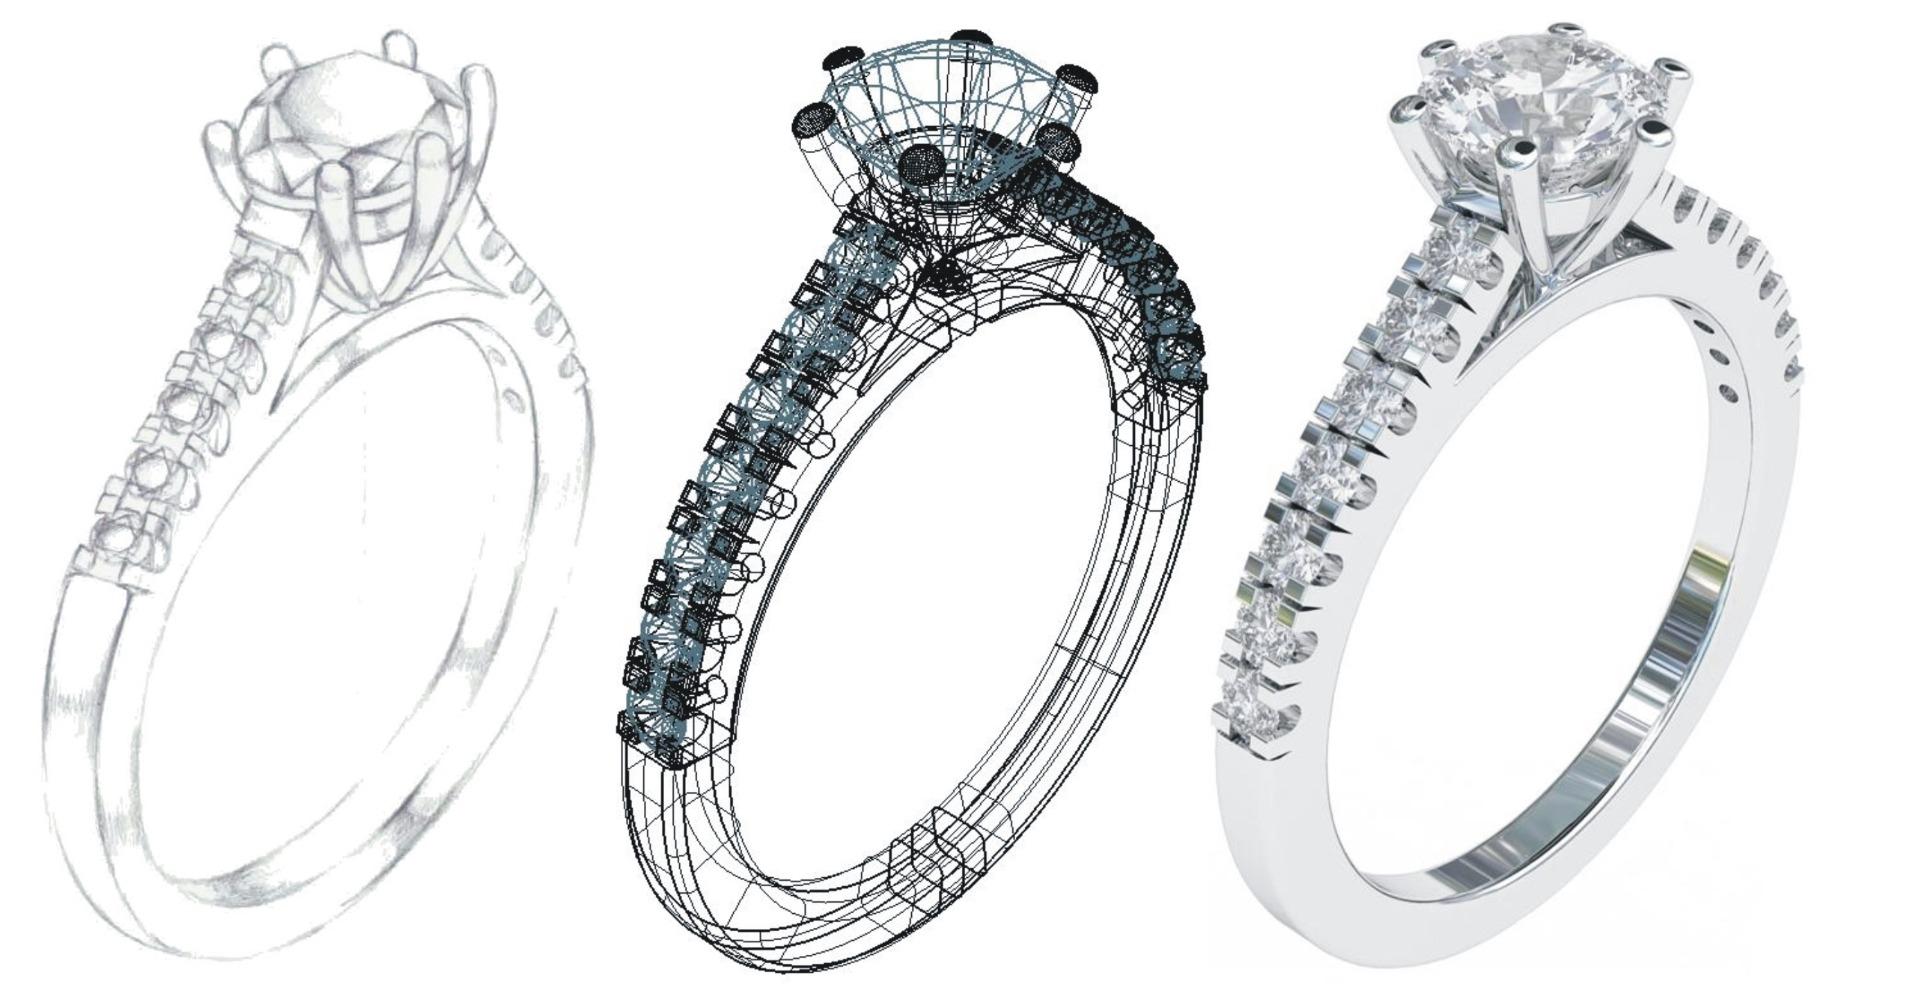 Exclusive diamond wedding rings from Aurus